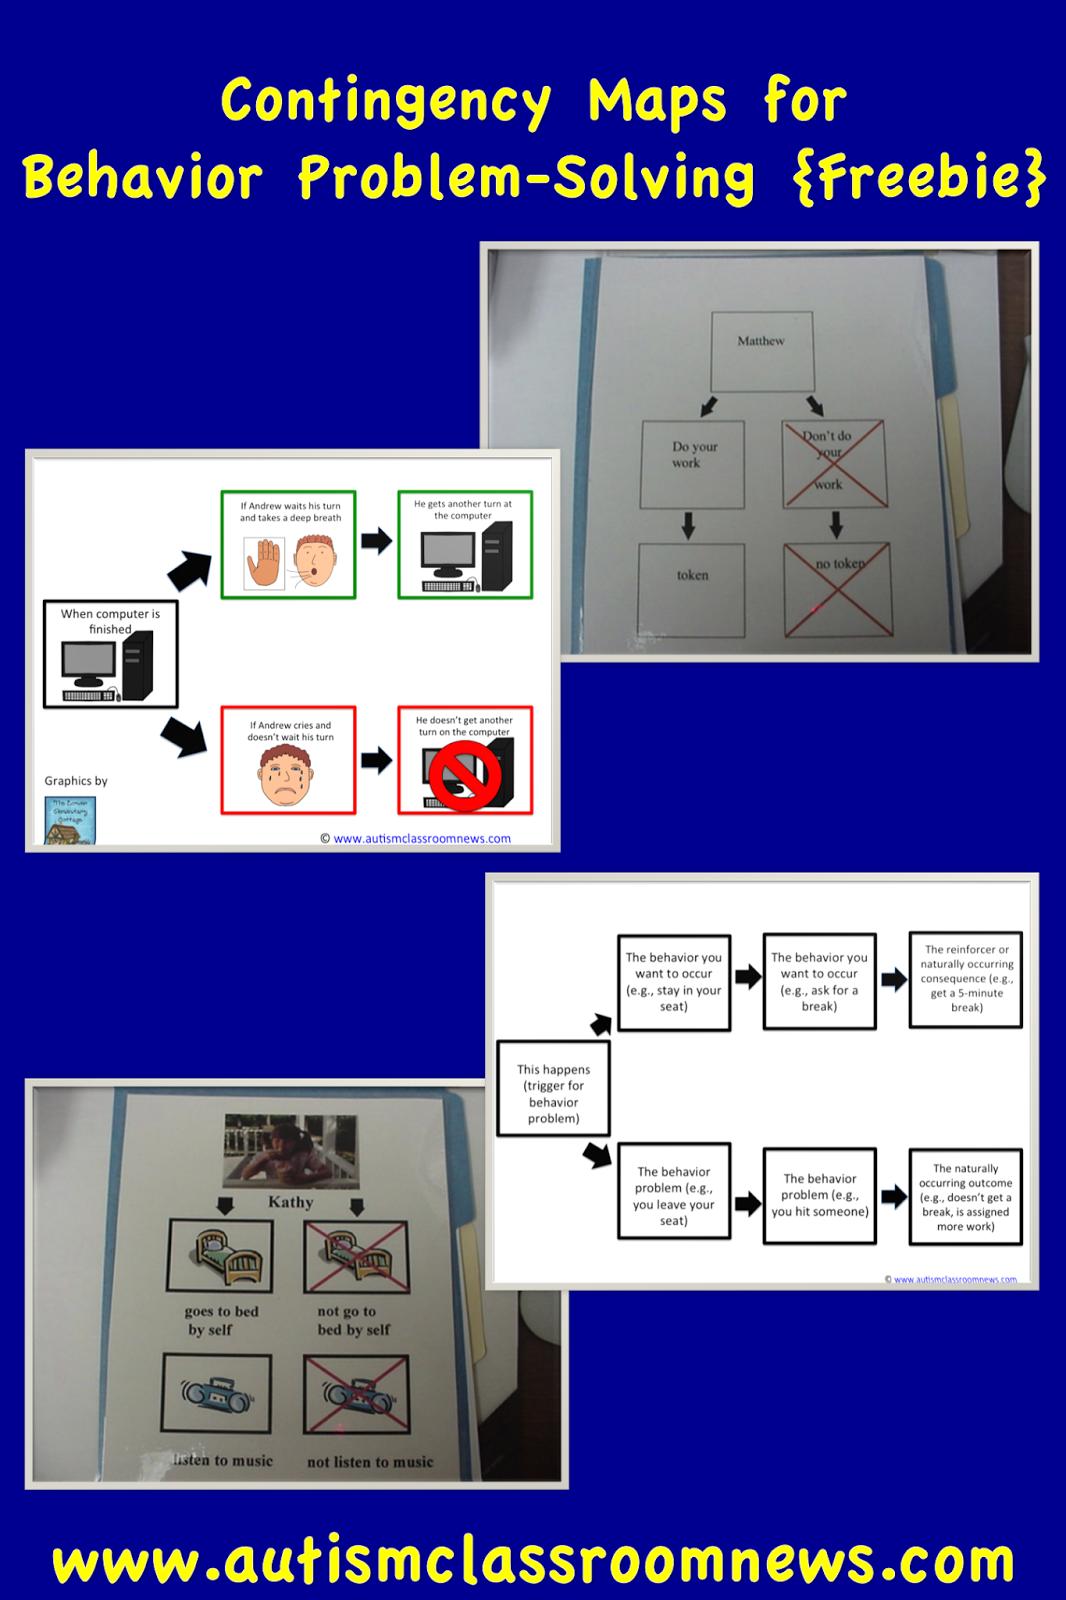 Contingency Maps for Behavior Problem-Solving (Freebie